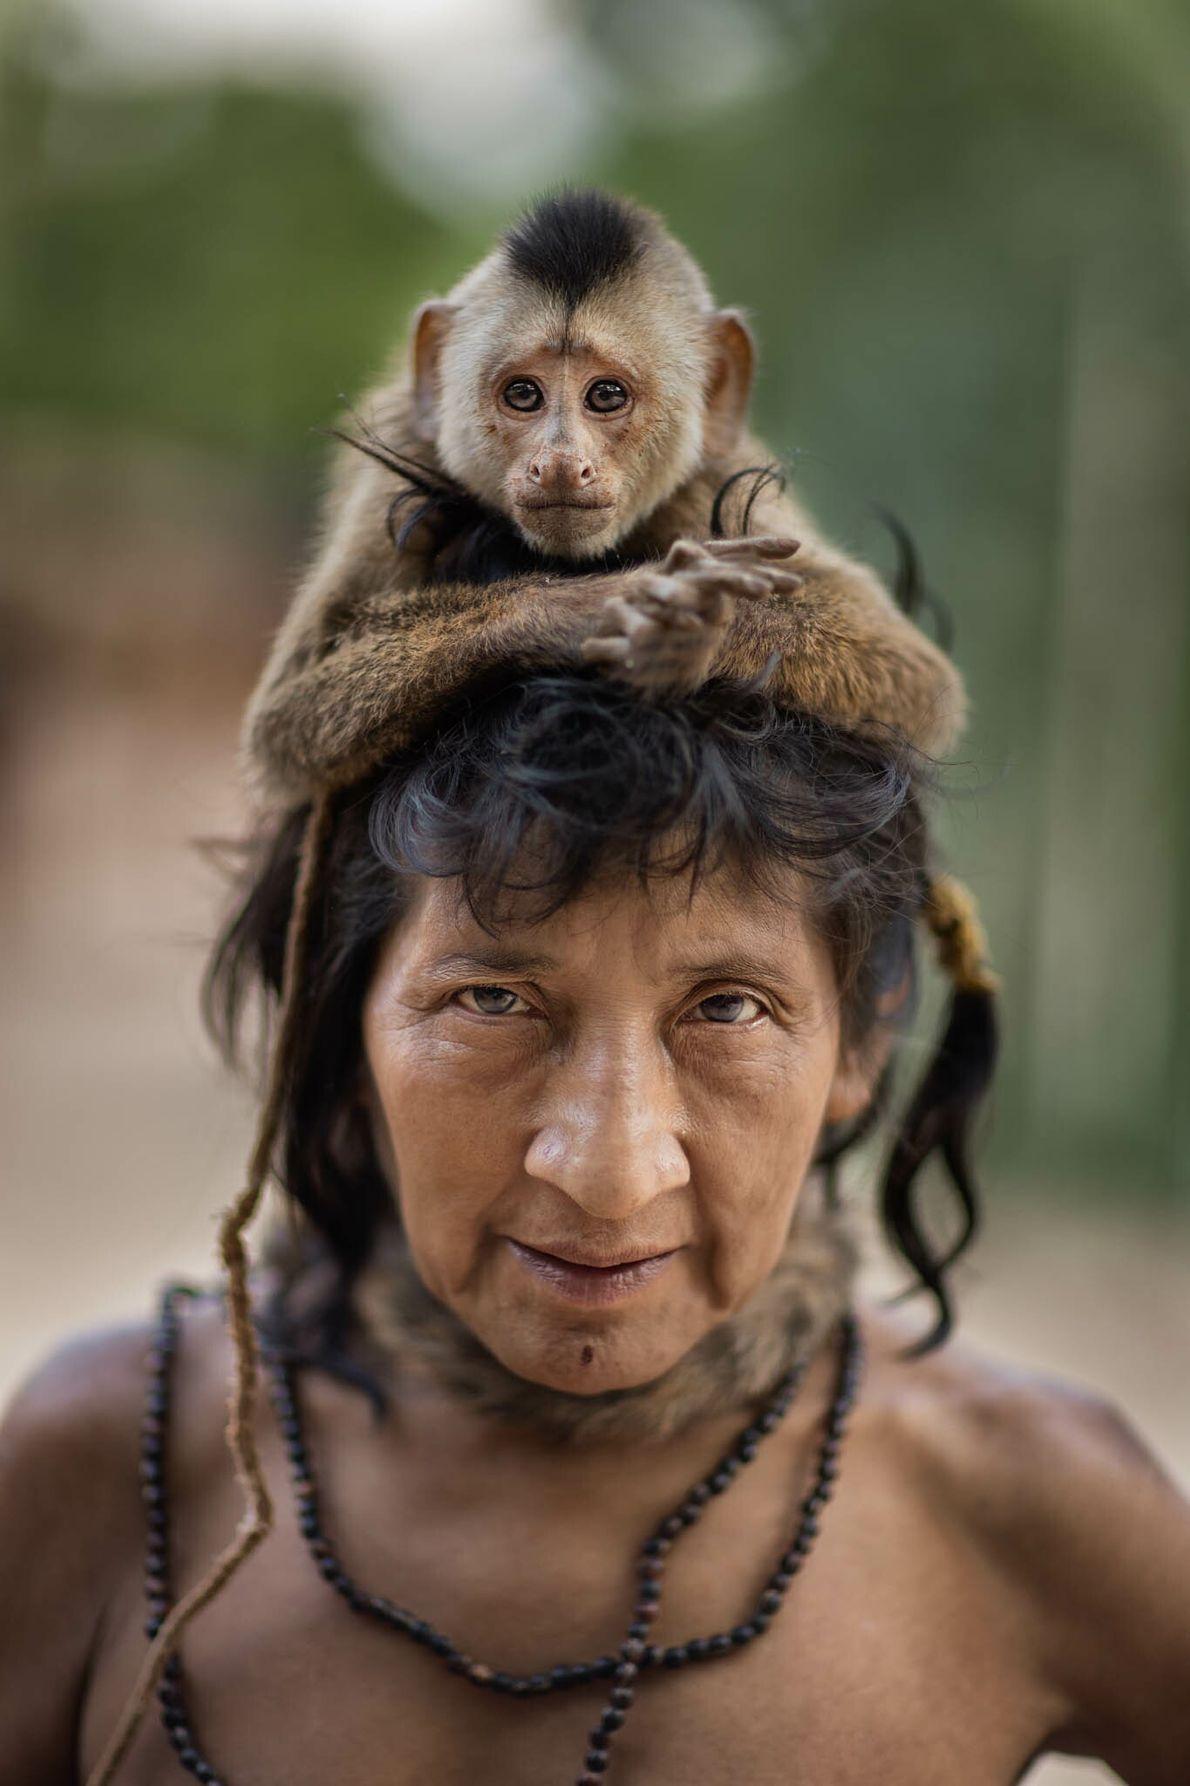 Ximirapi lleva un mono capuchino en la cabeza